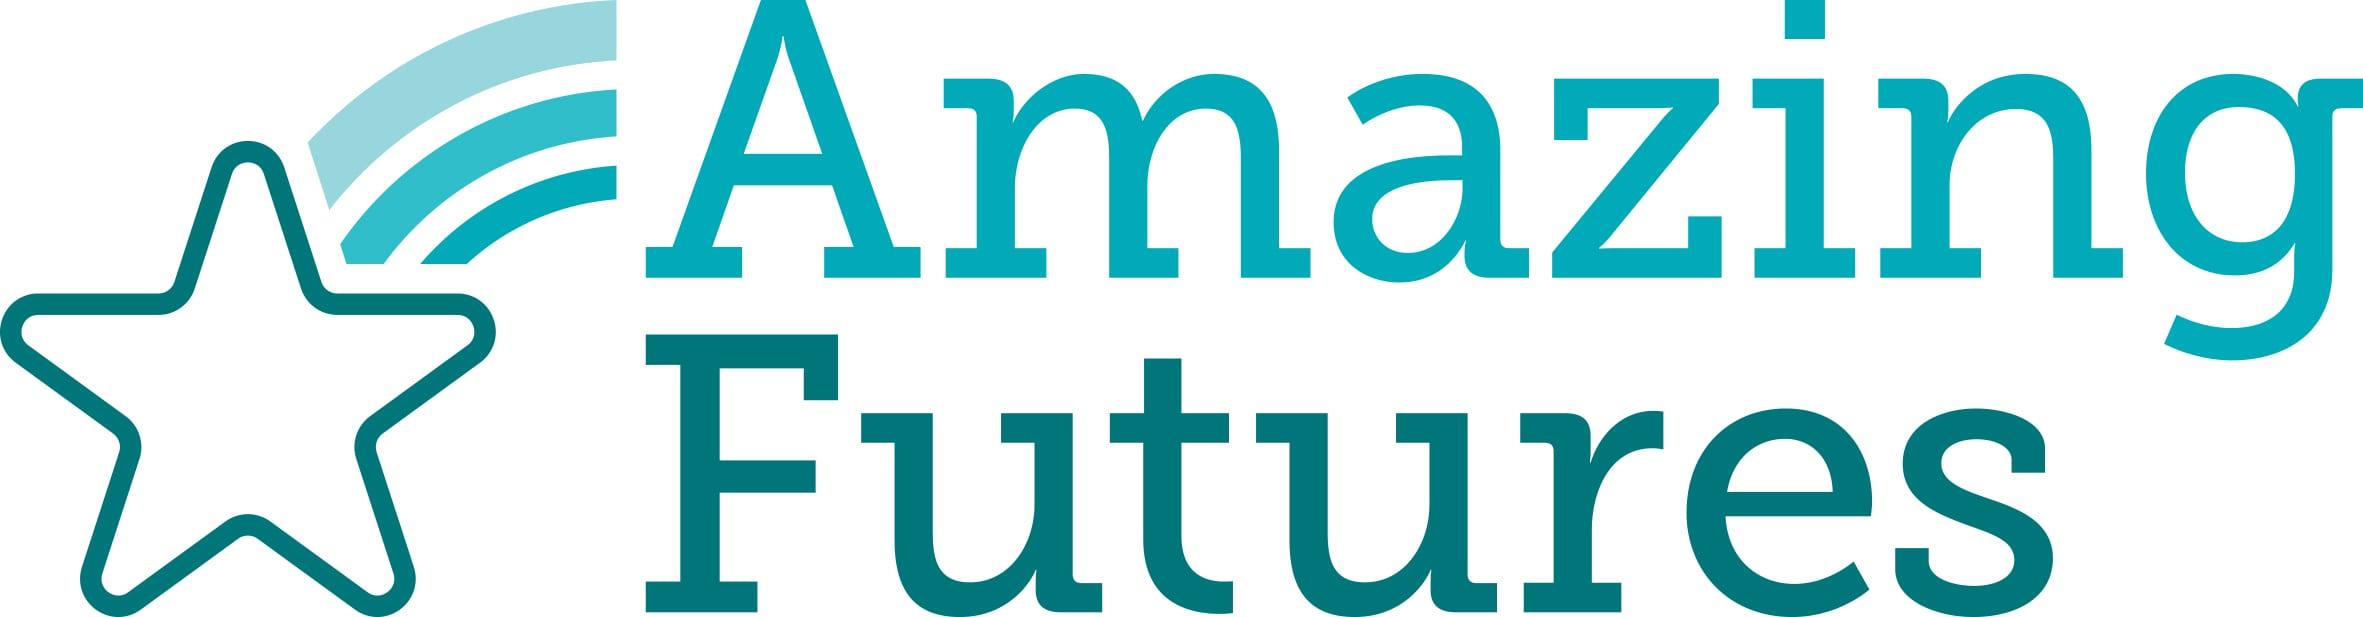 Amazing Futures - Social Media